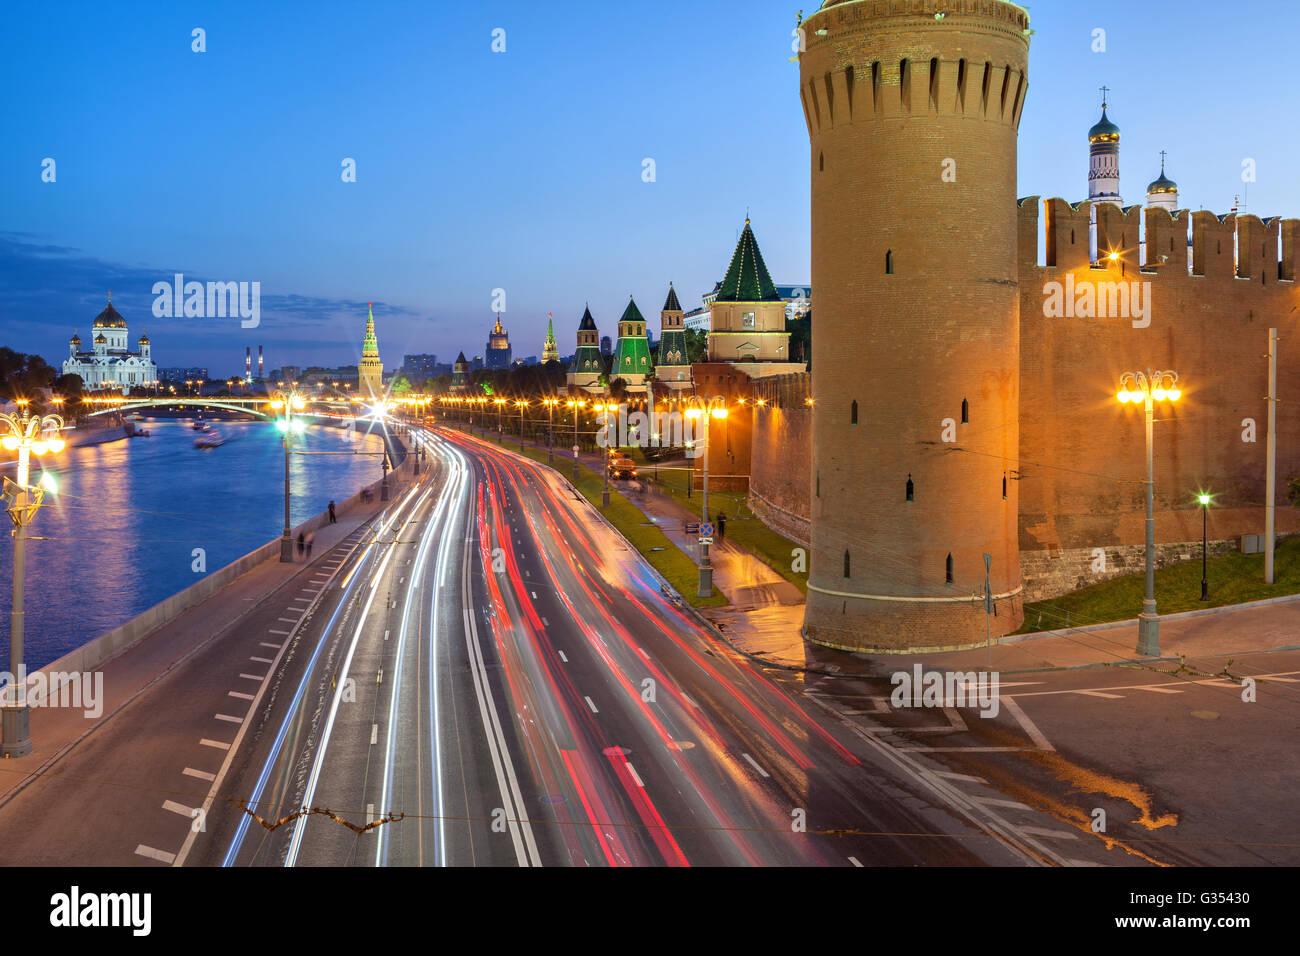 Kremlevskaya naberezhnaya and Kremlin wall in the evening, Moscow, Russia - Stock Image